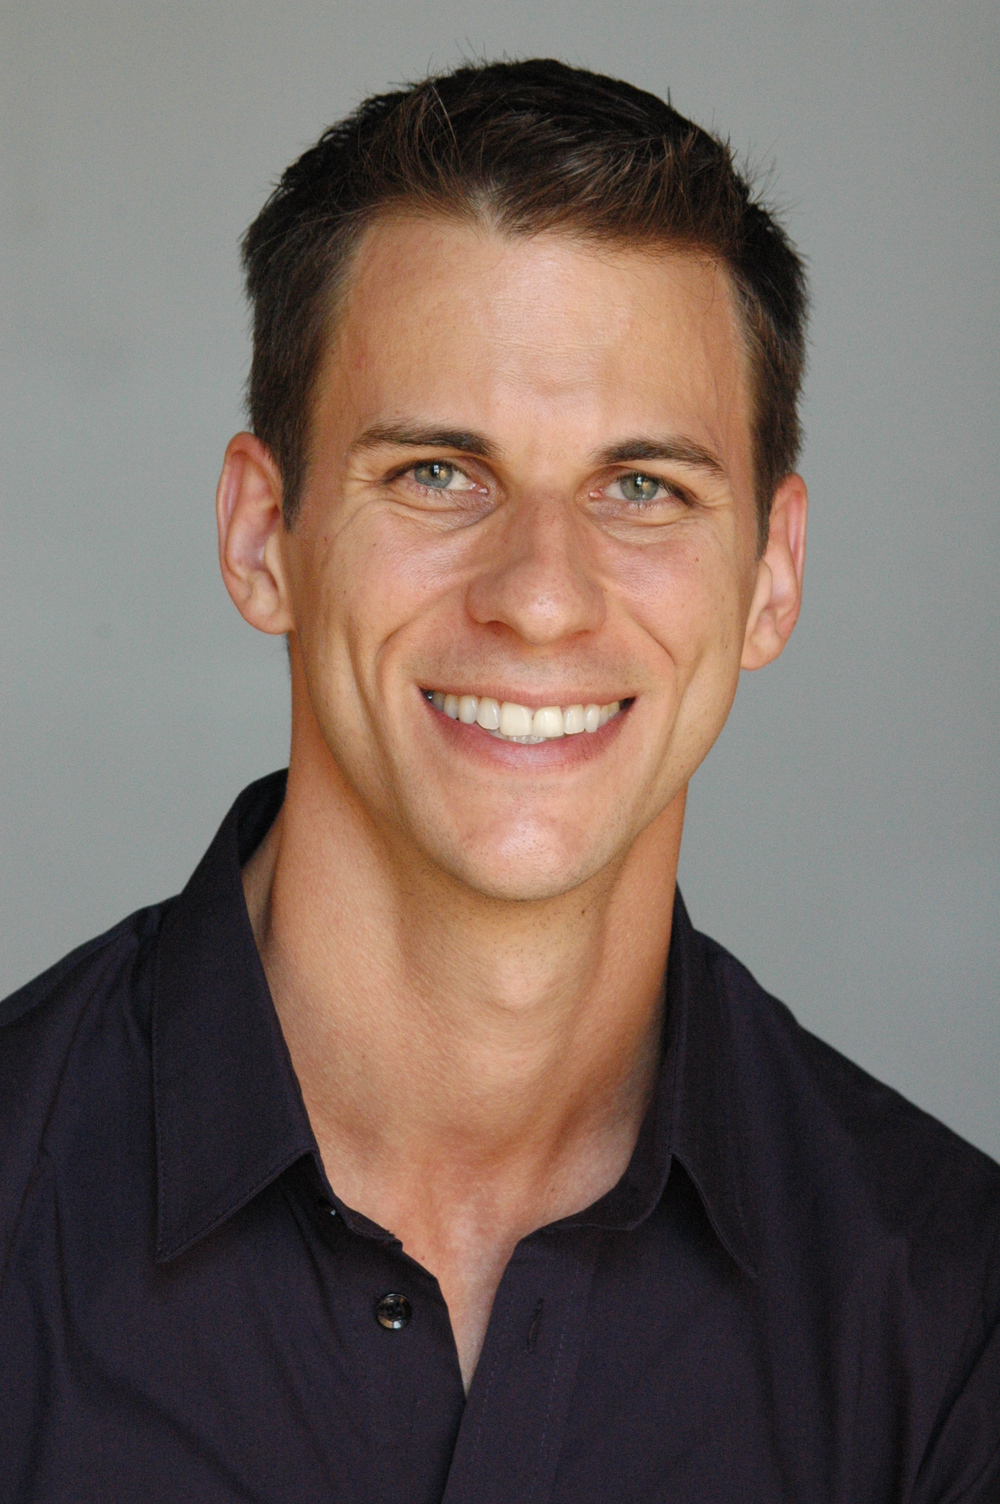 Matt Tumminello